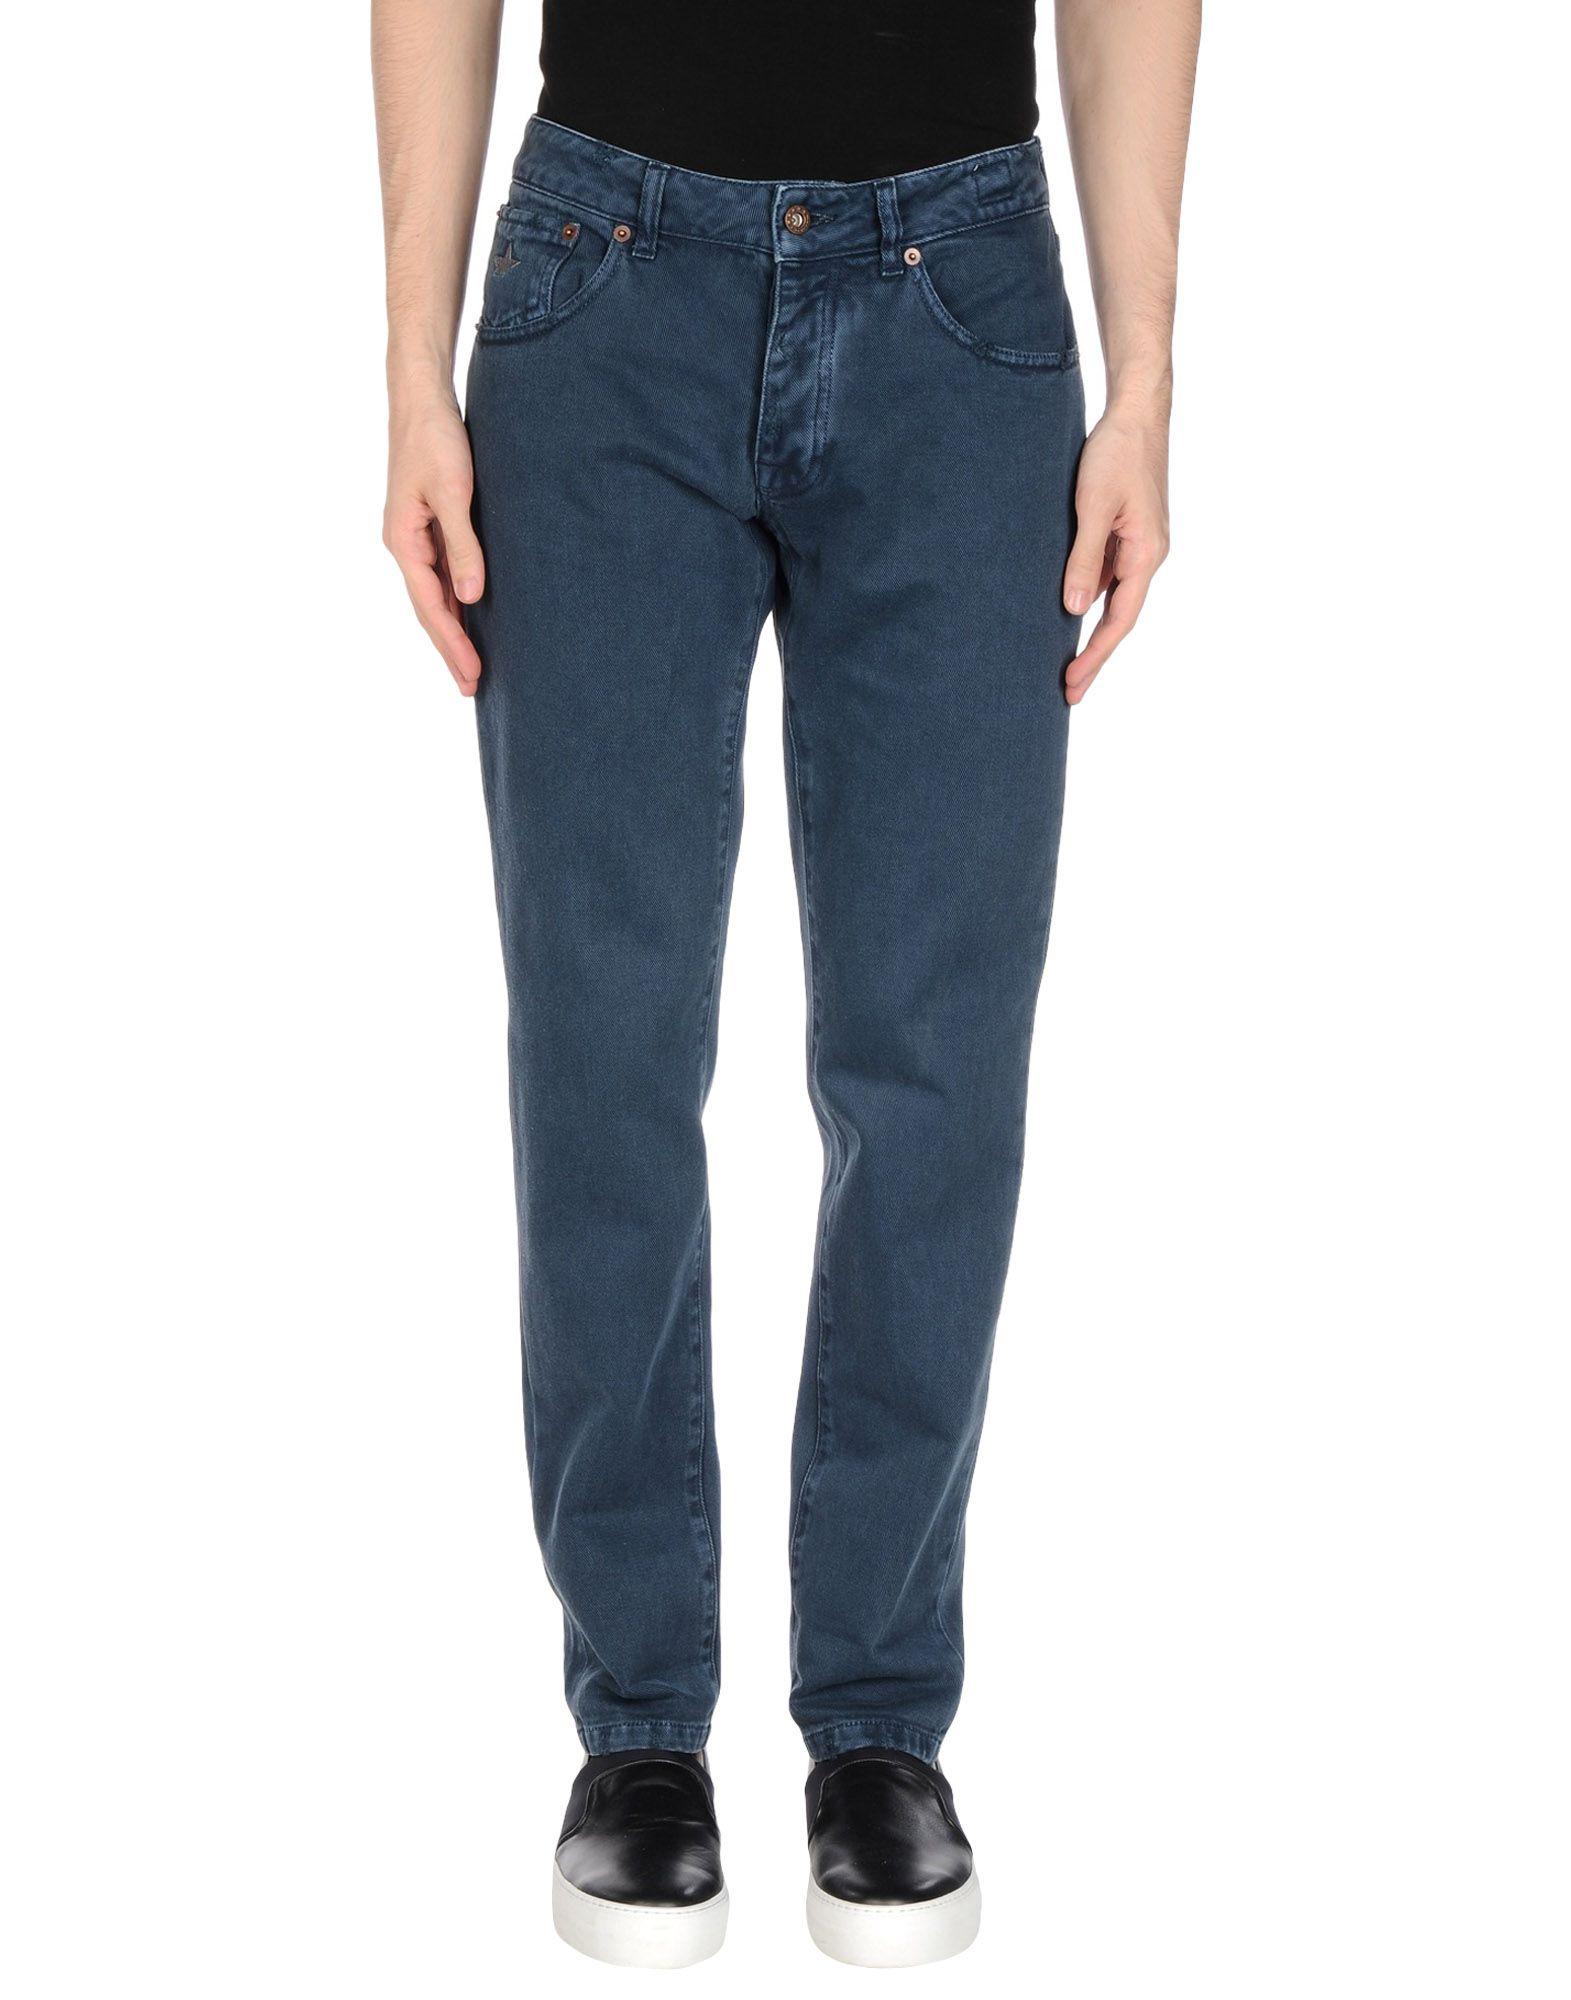 Pantaloni Uomo Jeans Macchia J Uomo Pantaloni - 13055787XD 3cb6e2